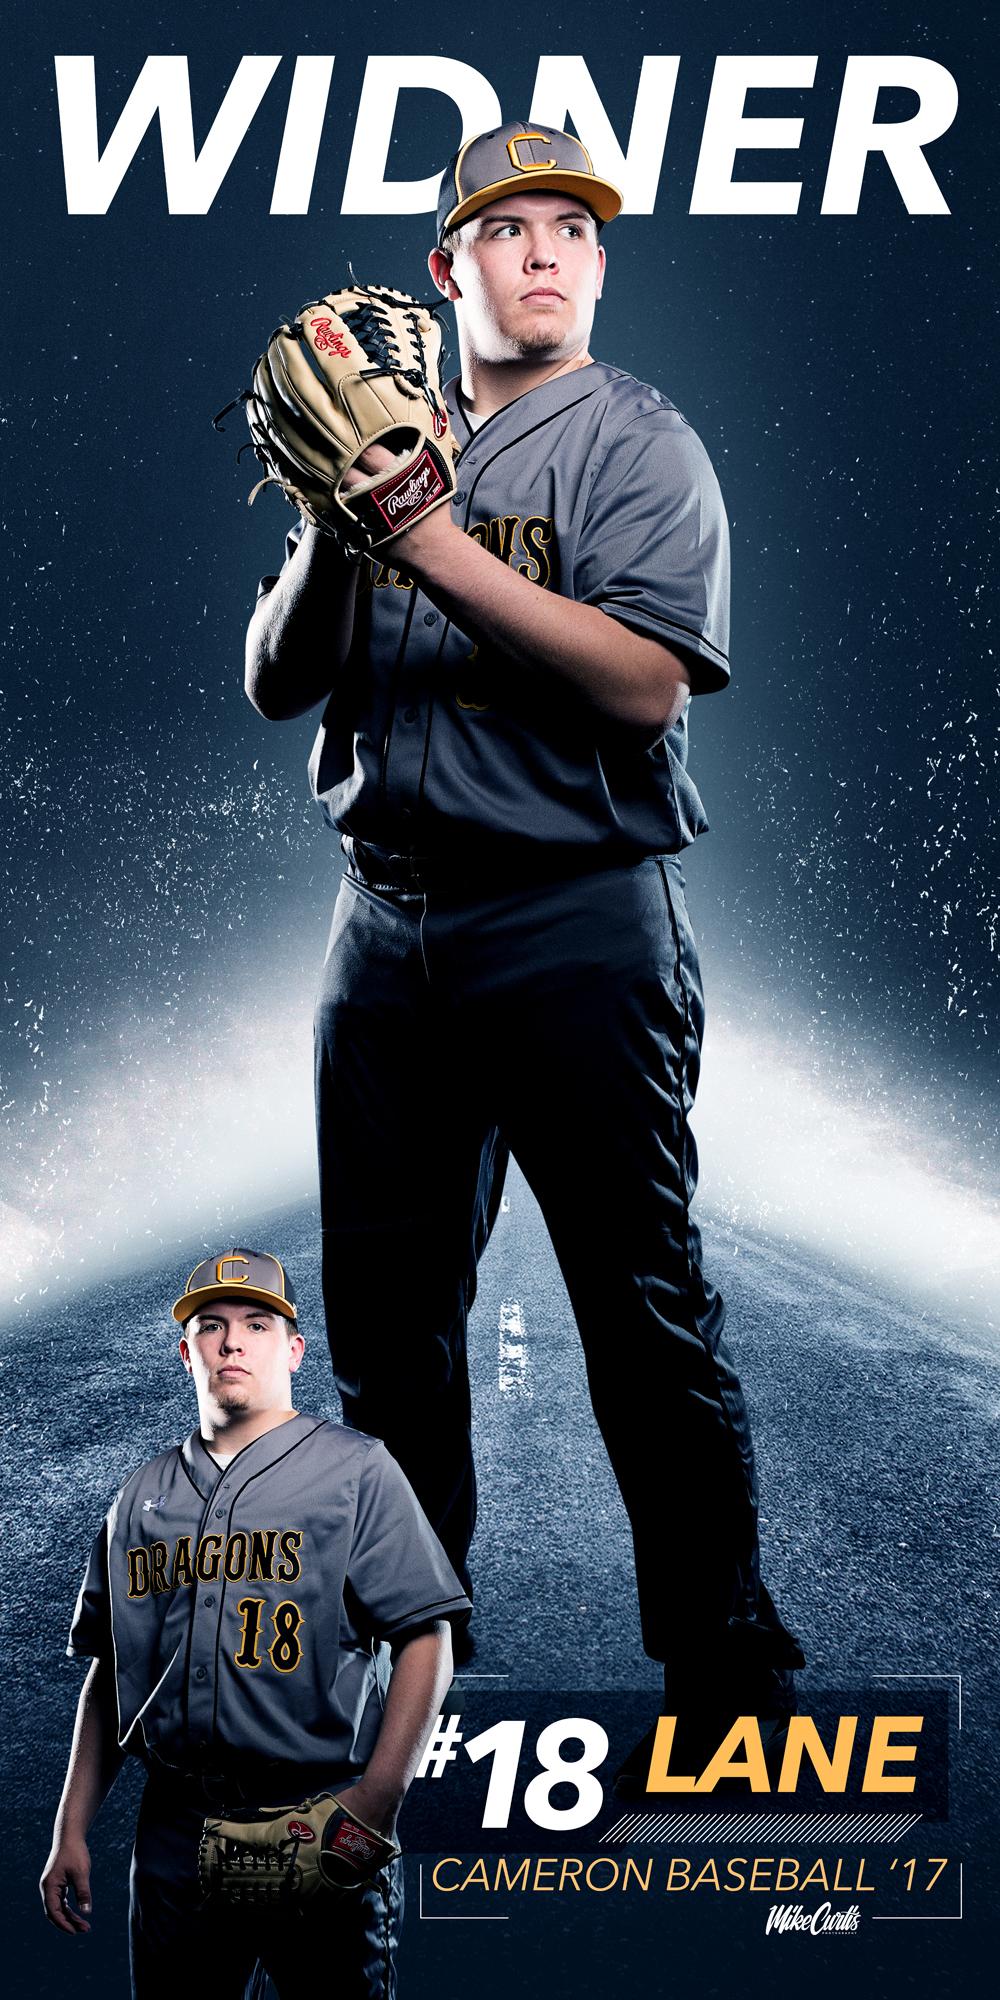 CHS-Baseball-17_Widner_2x4-Banner.jpg